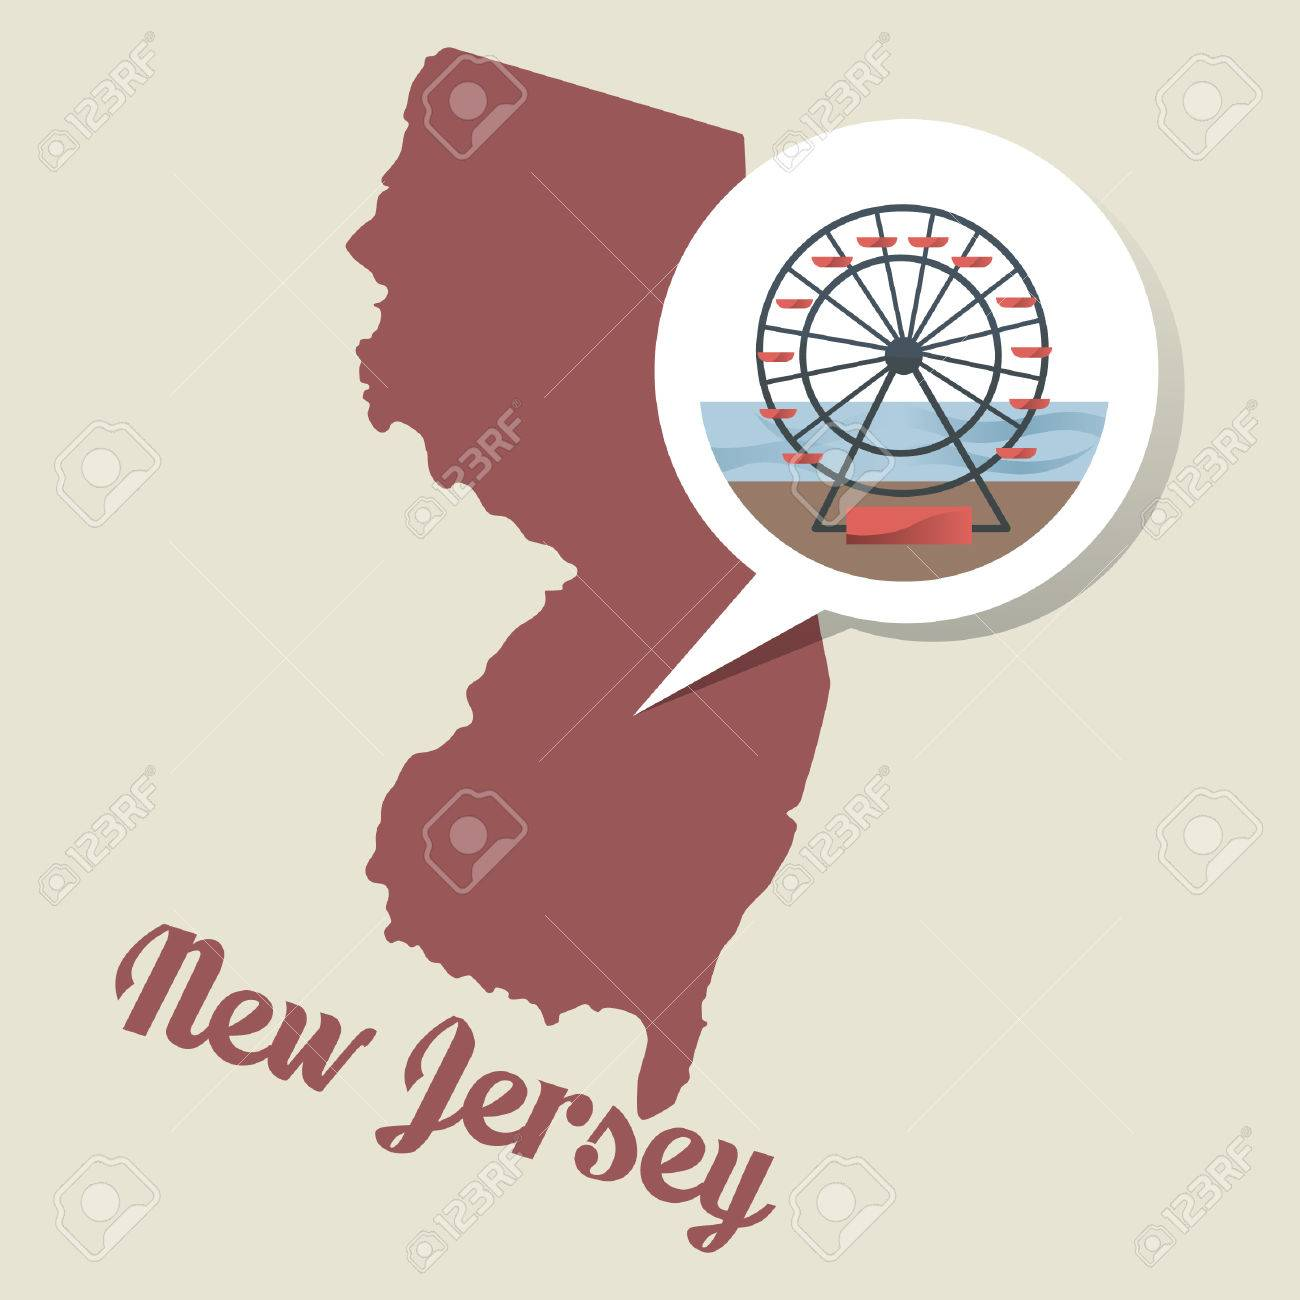 New Jersey Map With Atlantic City Boardawalk Icon Royalty Free - Newjerseymap